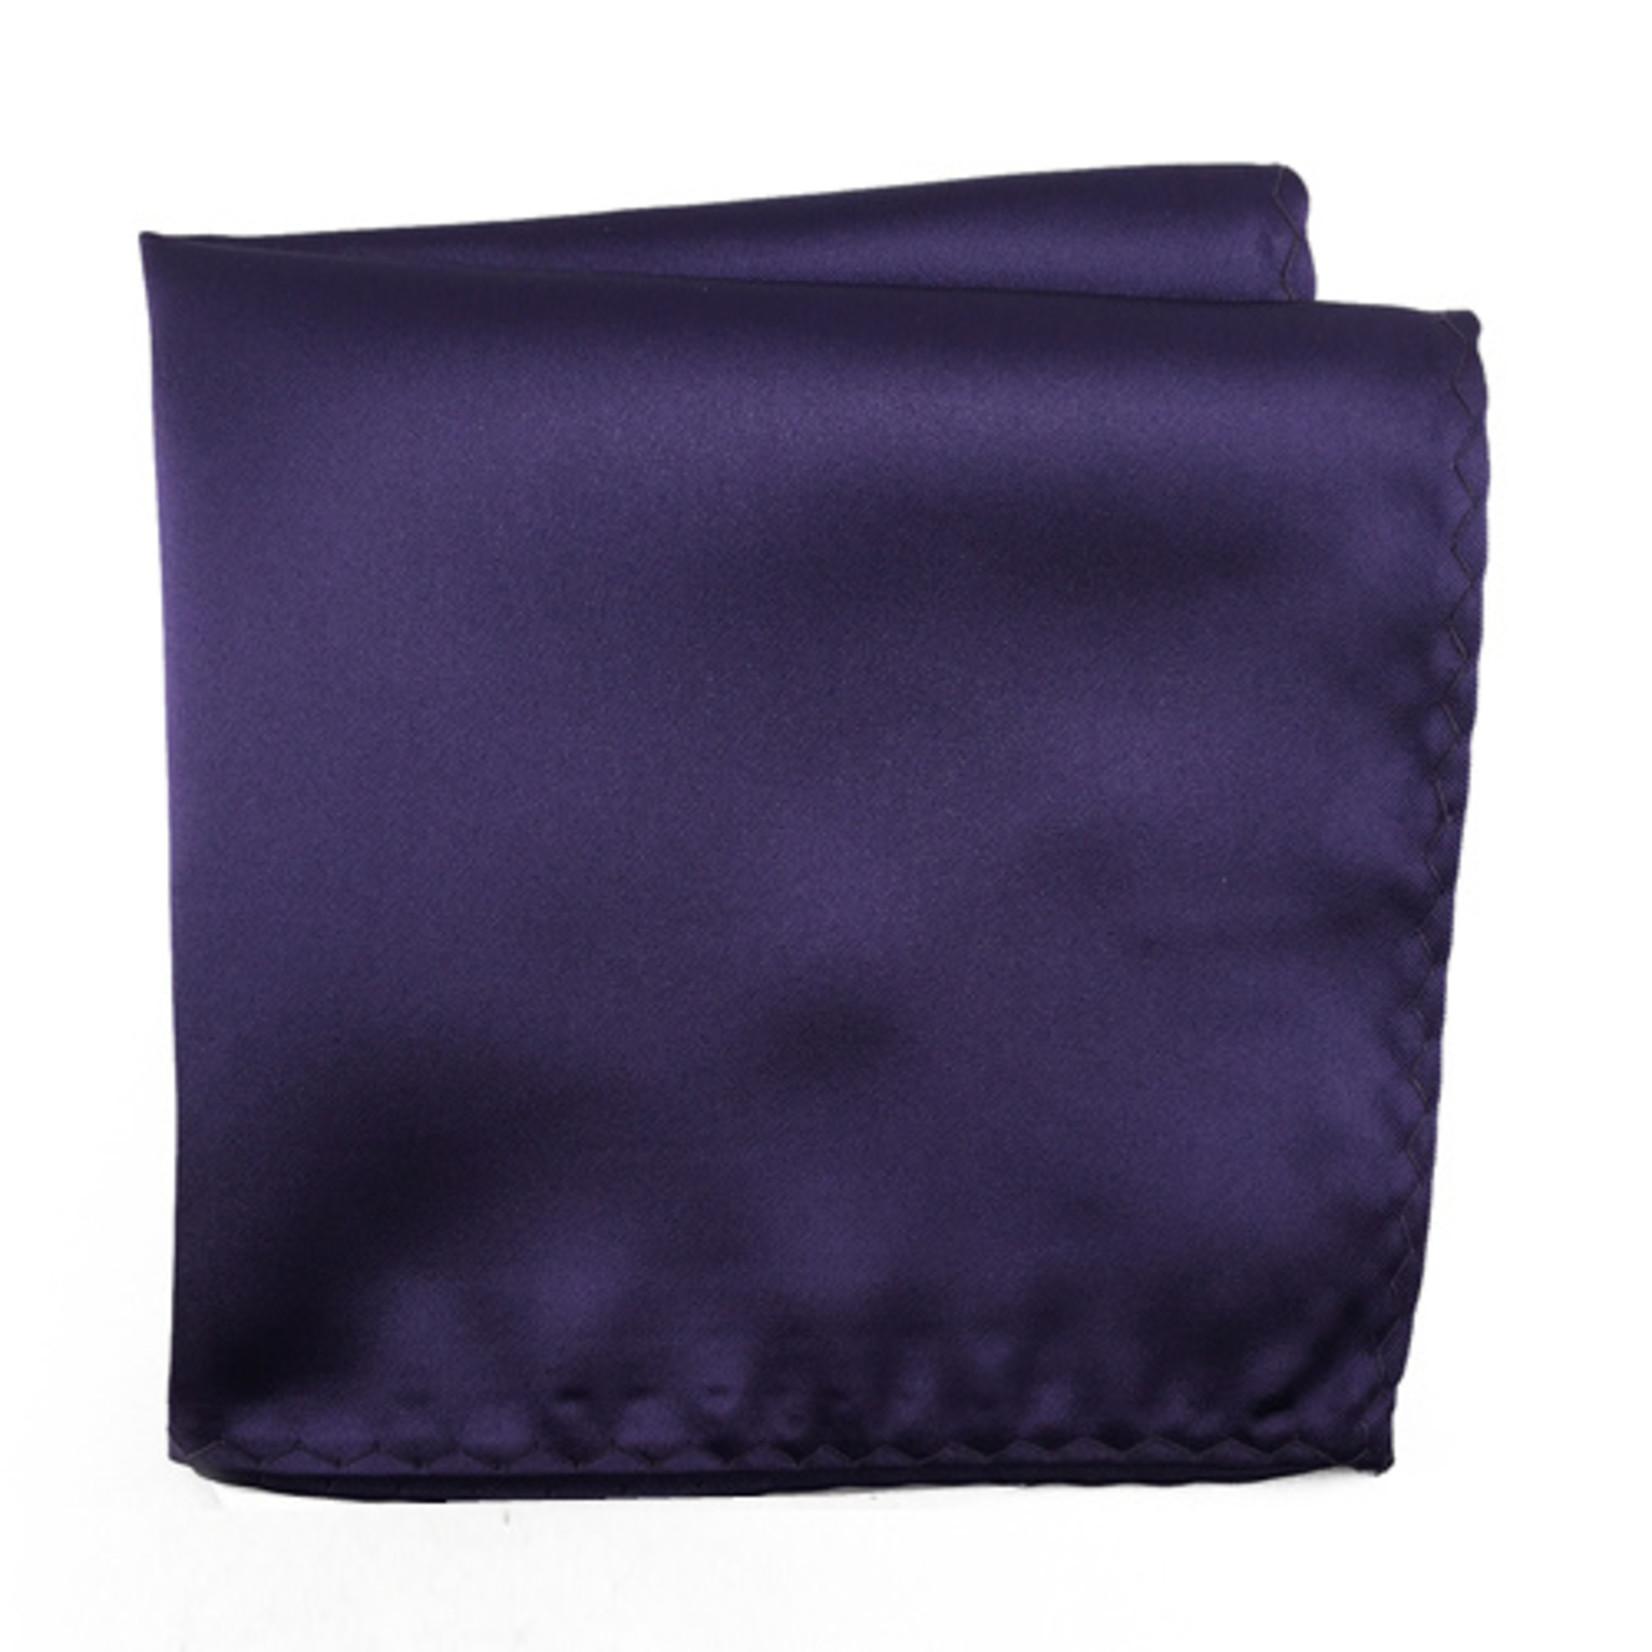 Knotz M100PSQ-35 Solid Purple Pocket Square